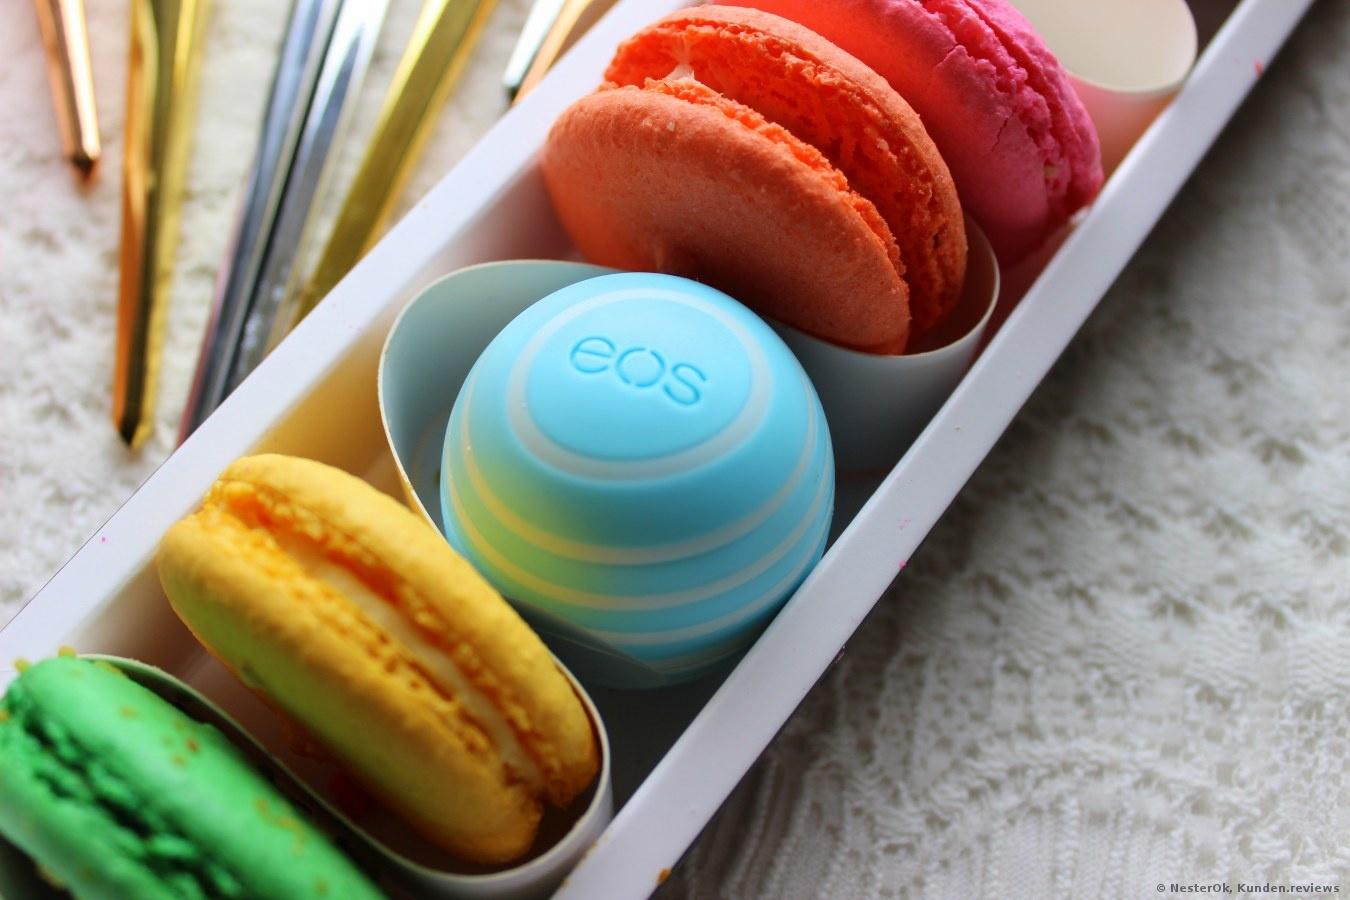 EOS Visibly Soft Lippenbalsam